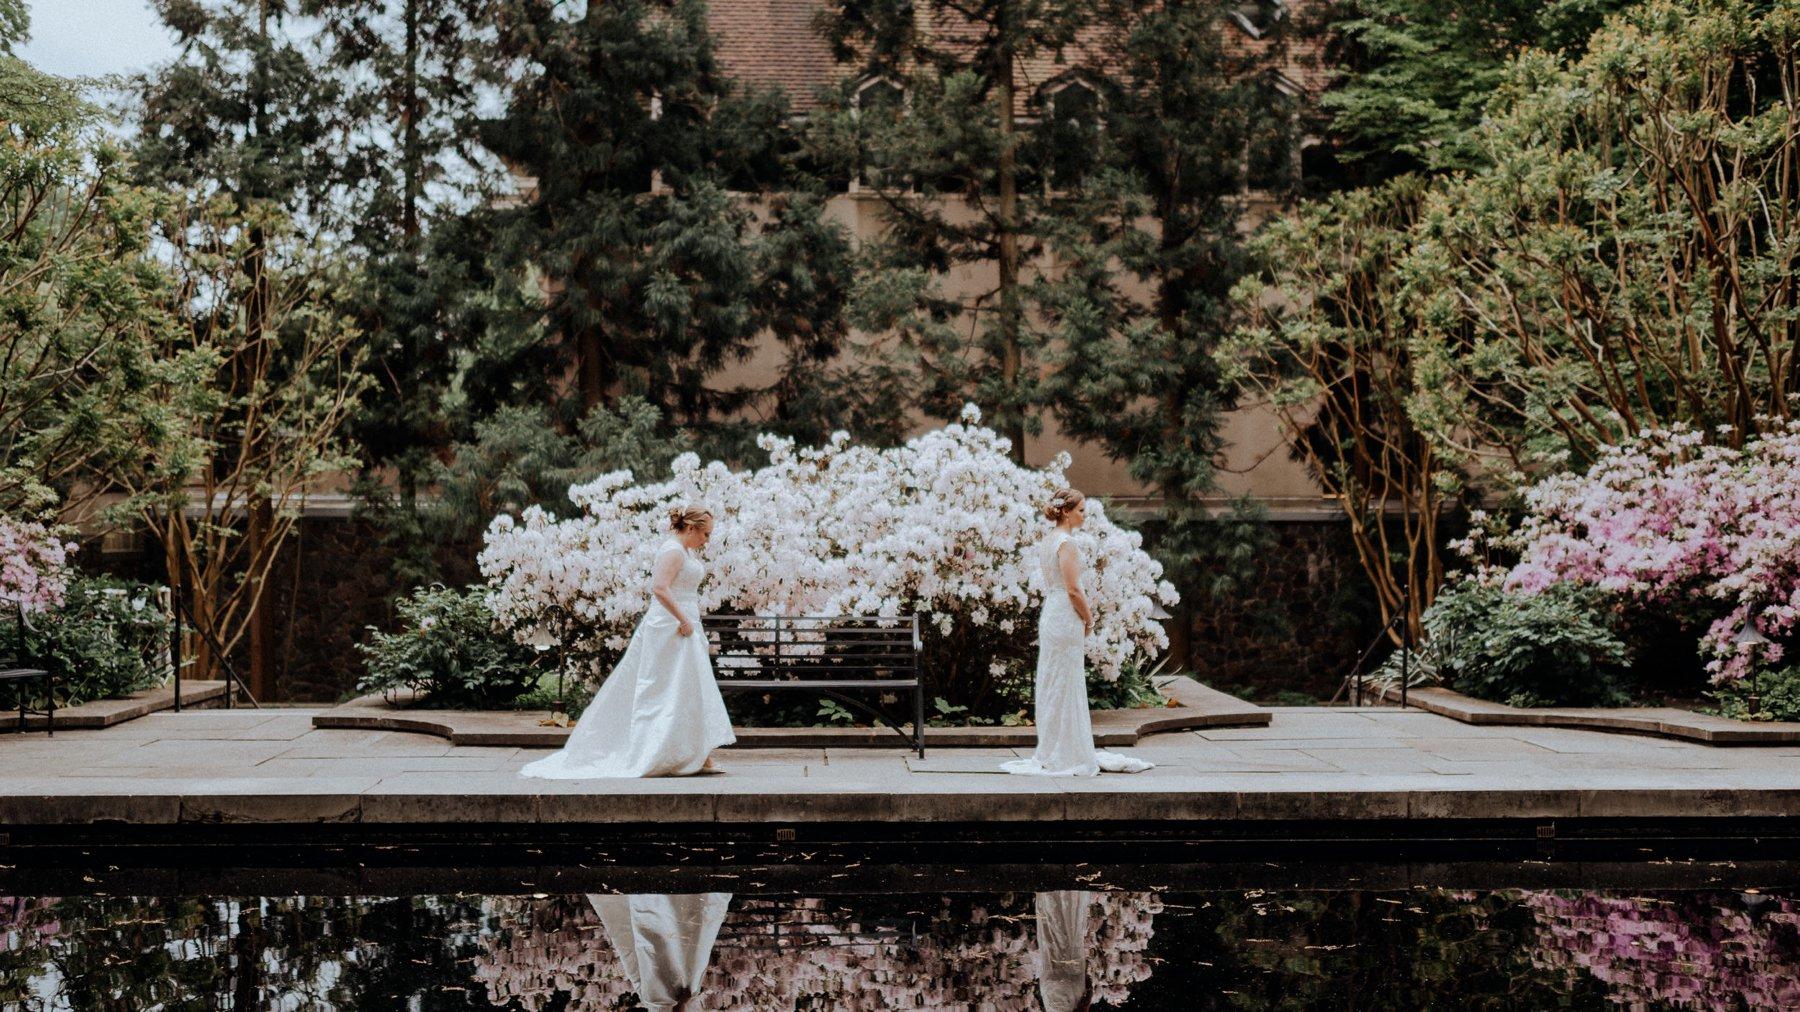 154-148-winterthur-wedding-1.jpg